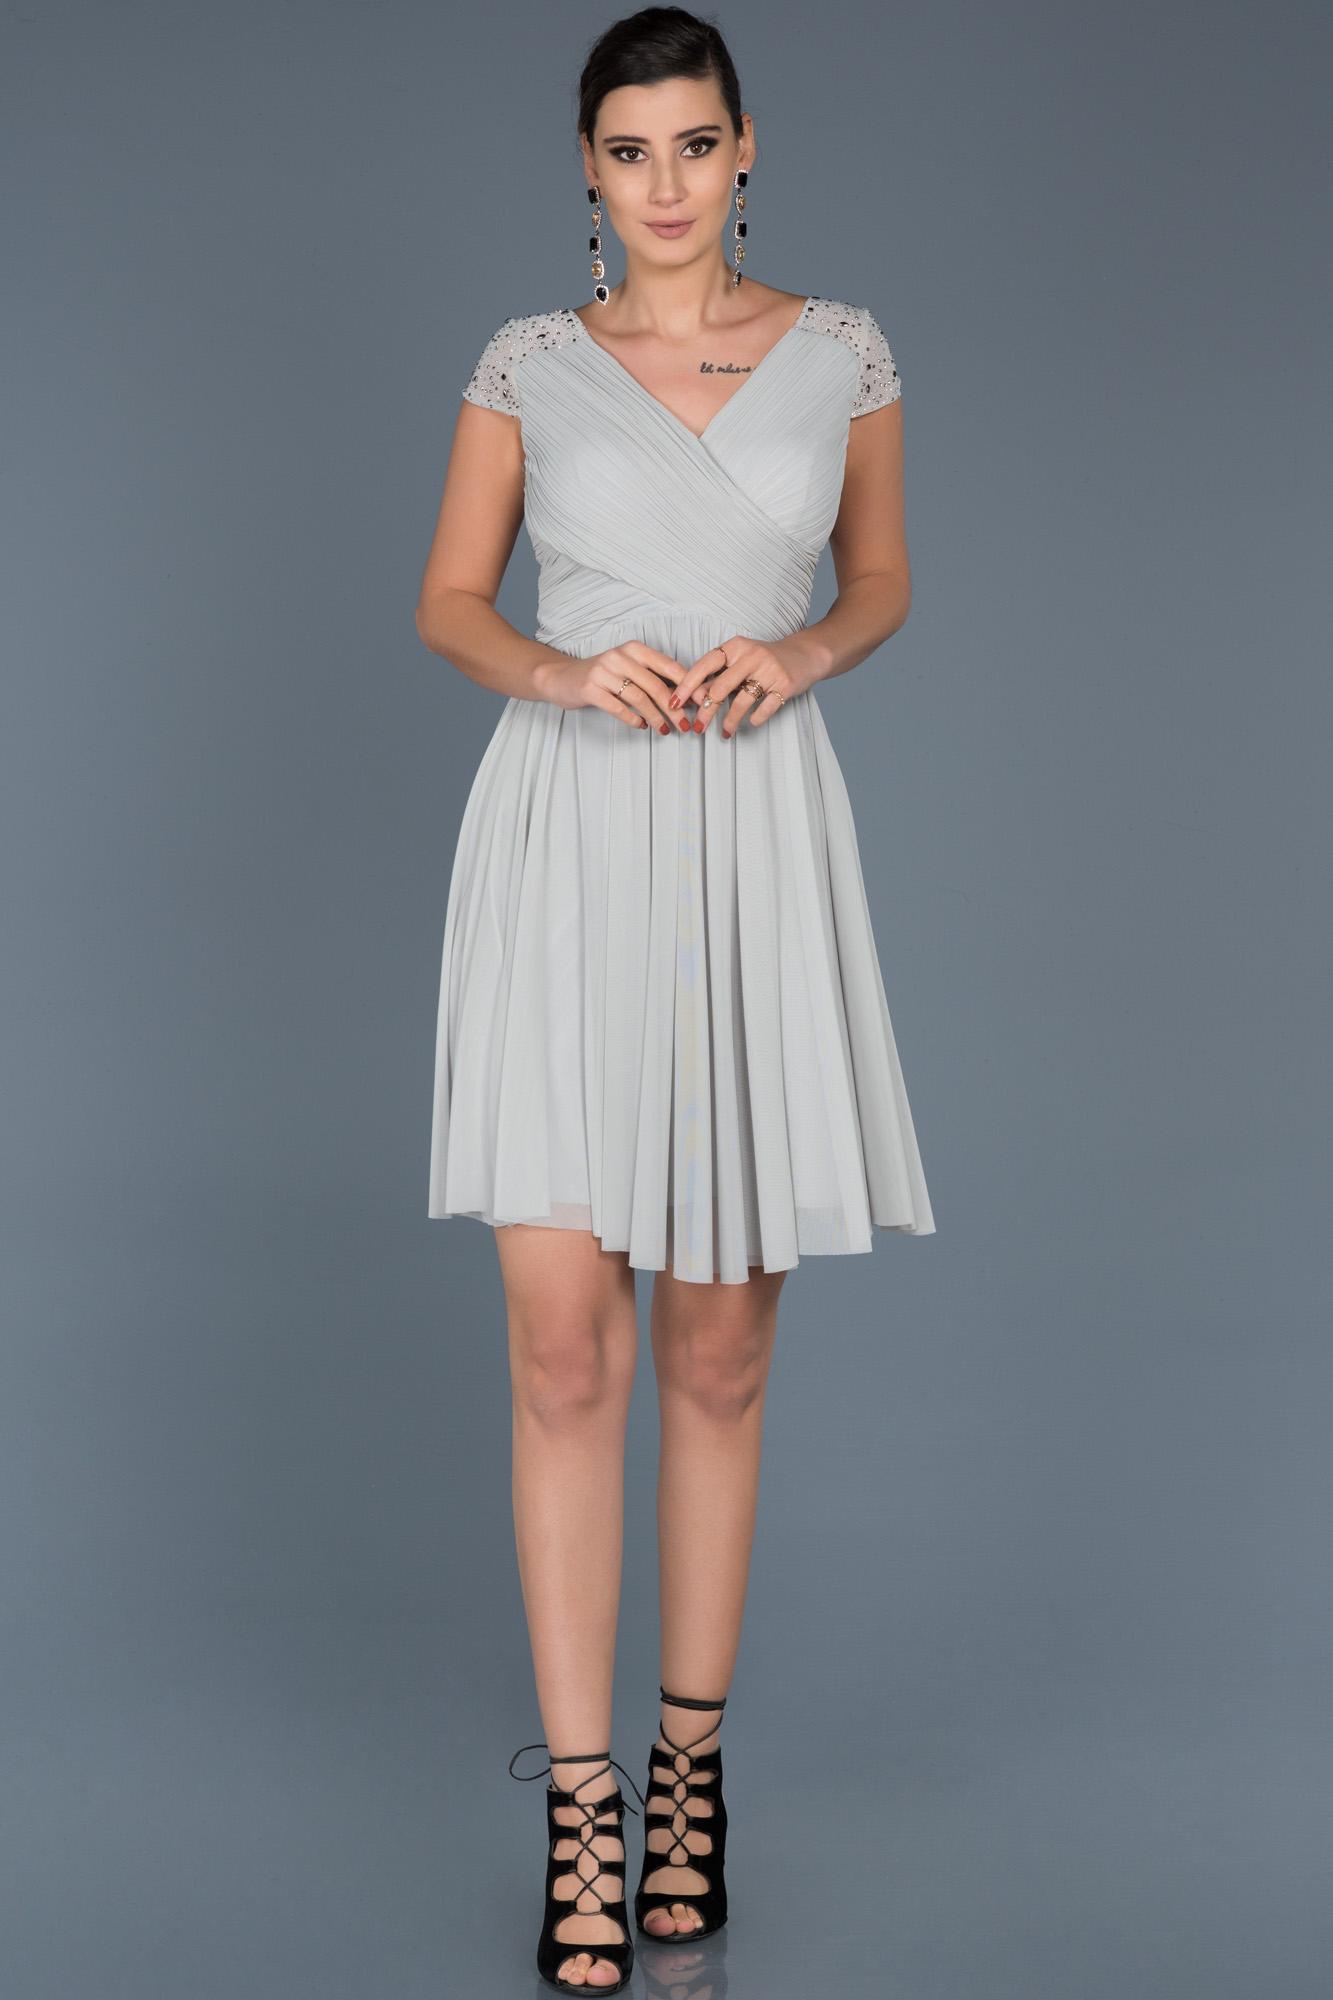 Gri V Yaka Şifon Elbise